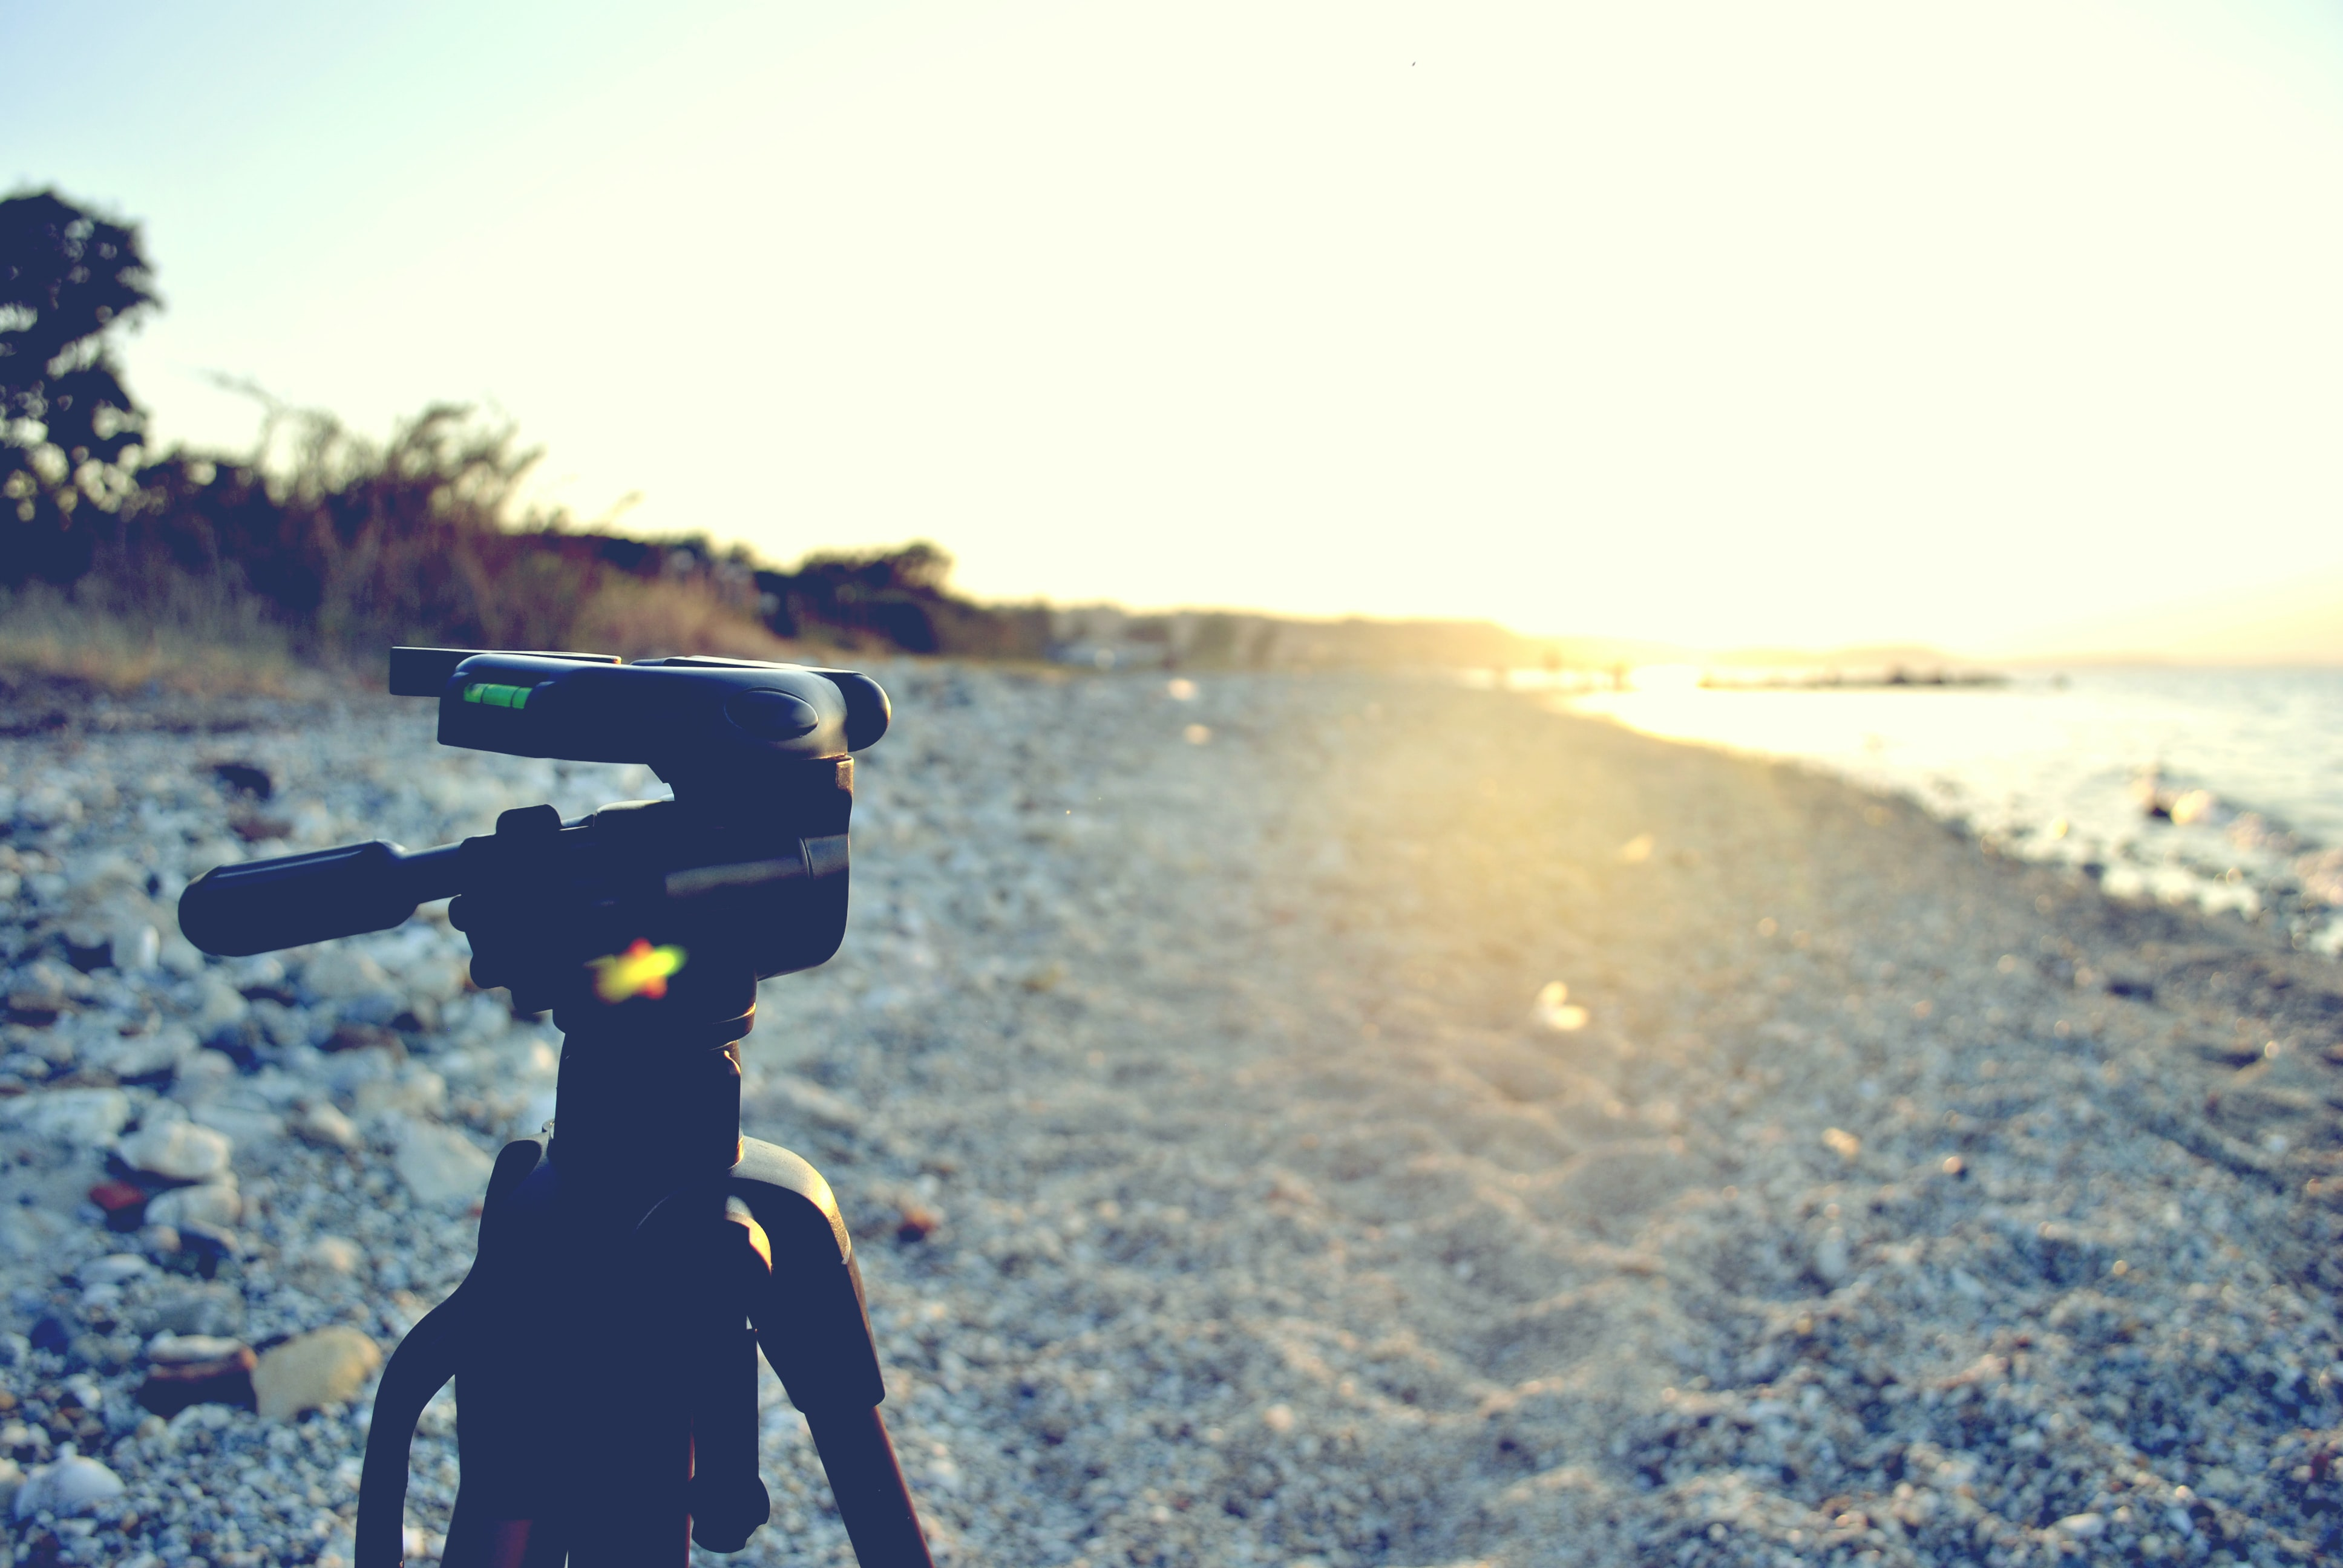 Camera tripod on a rock pebble beach at sunset in Halkidiki